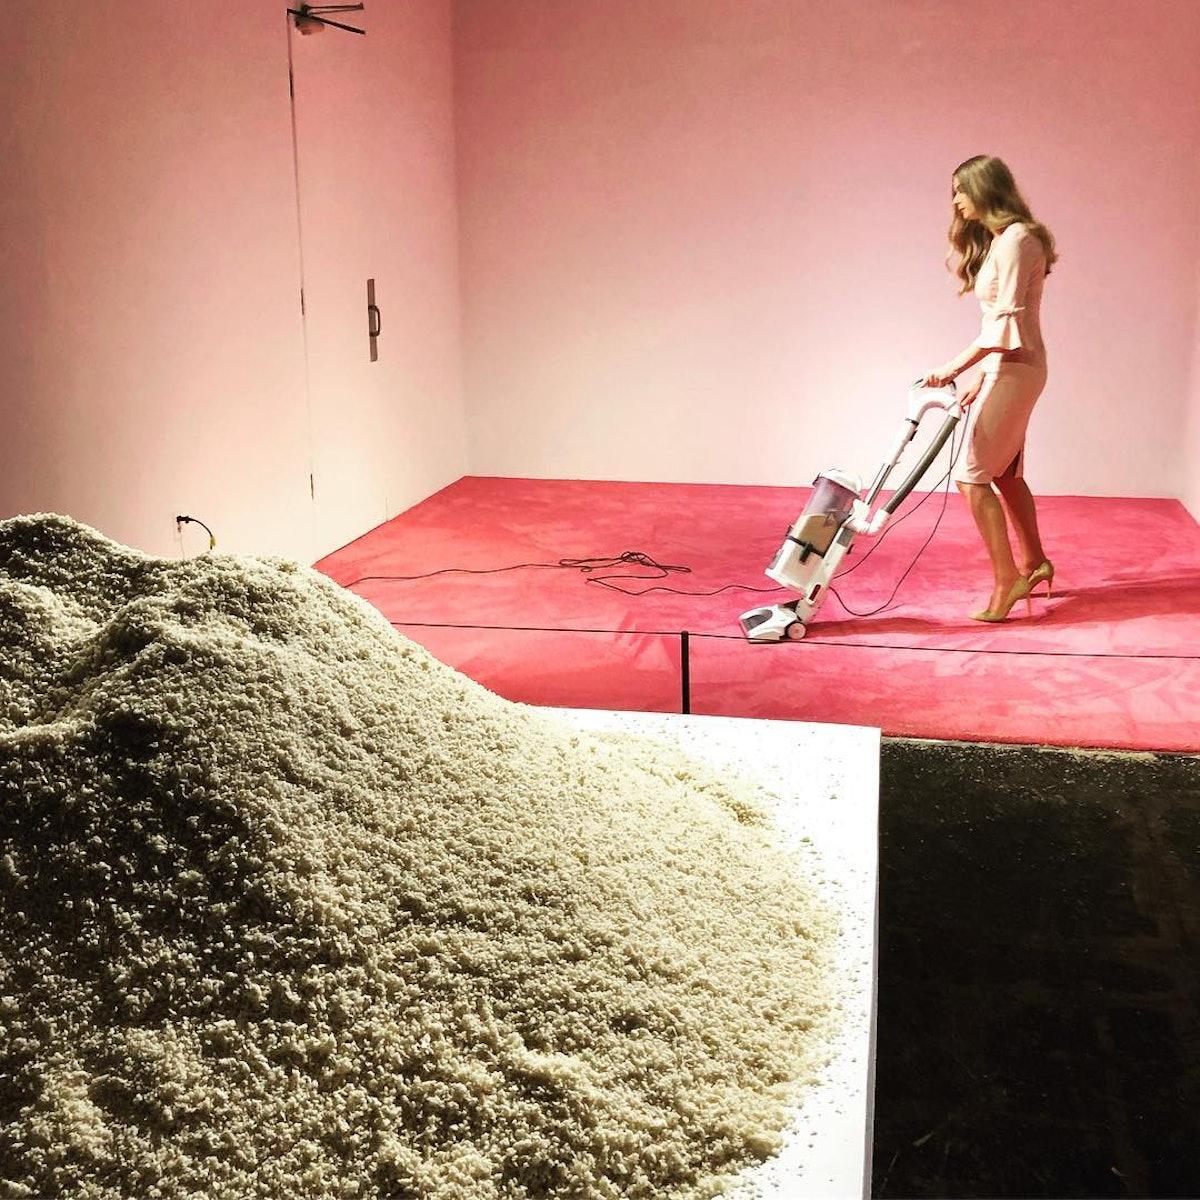 ivanka-vacuuming-insta.jpg